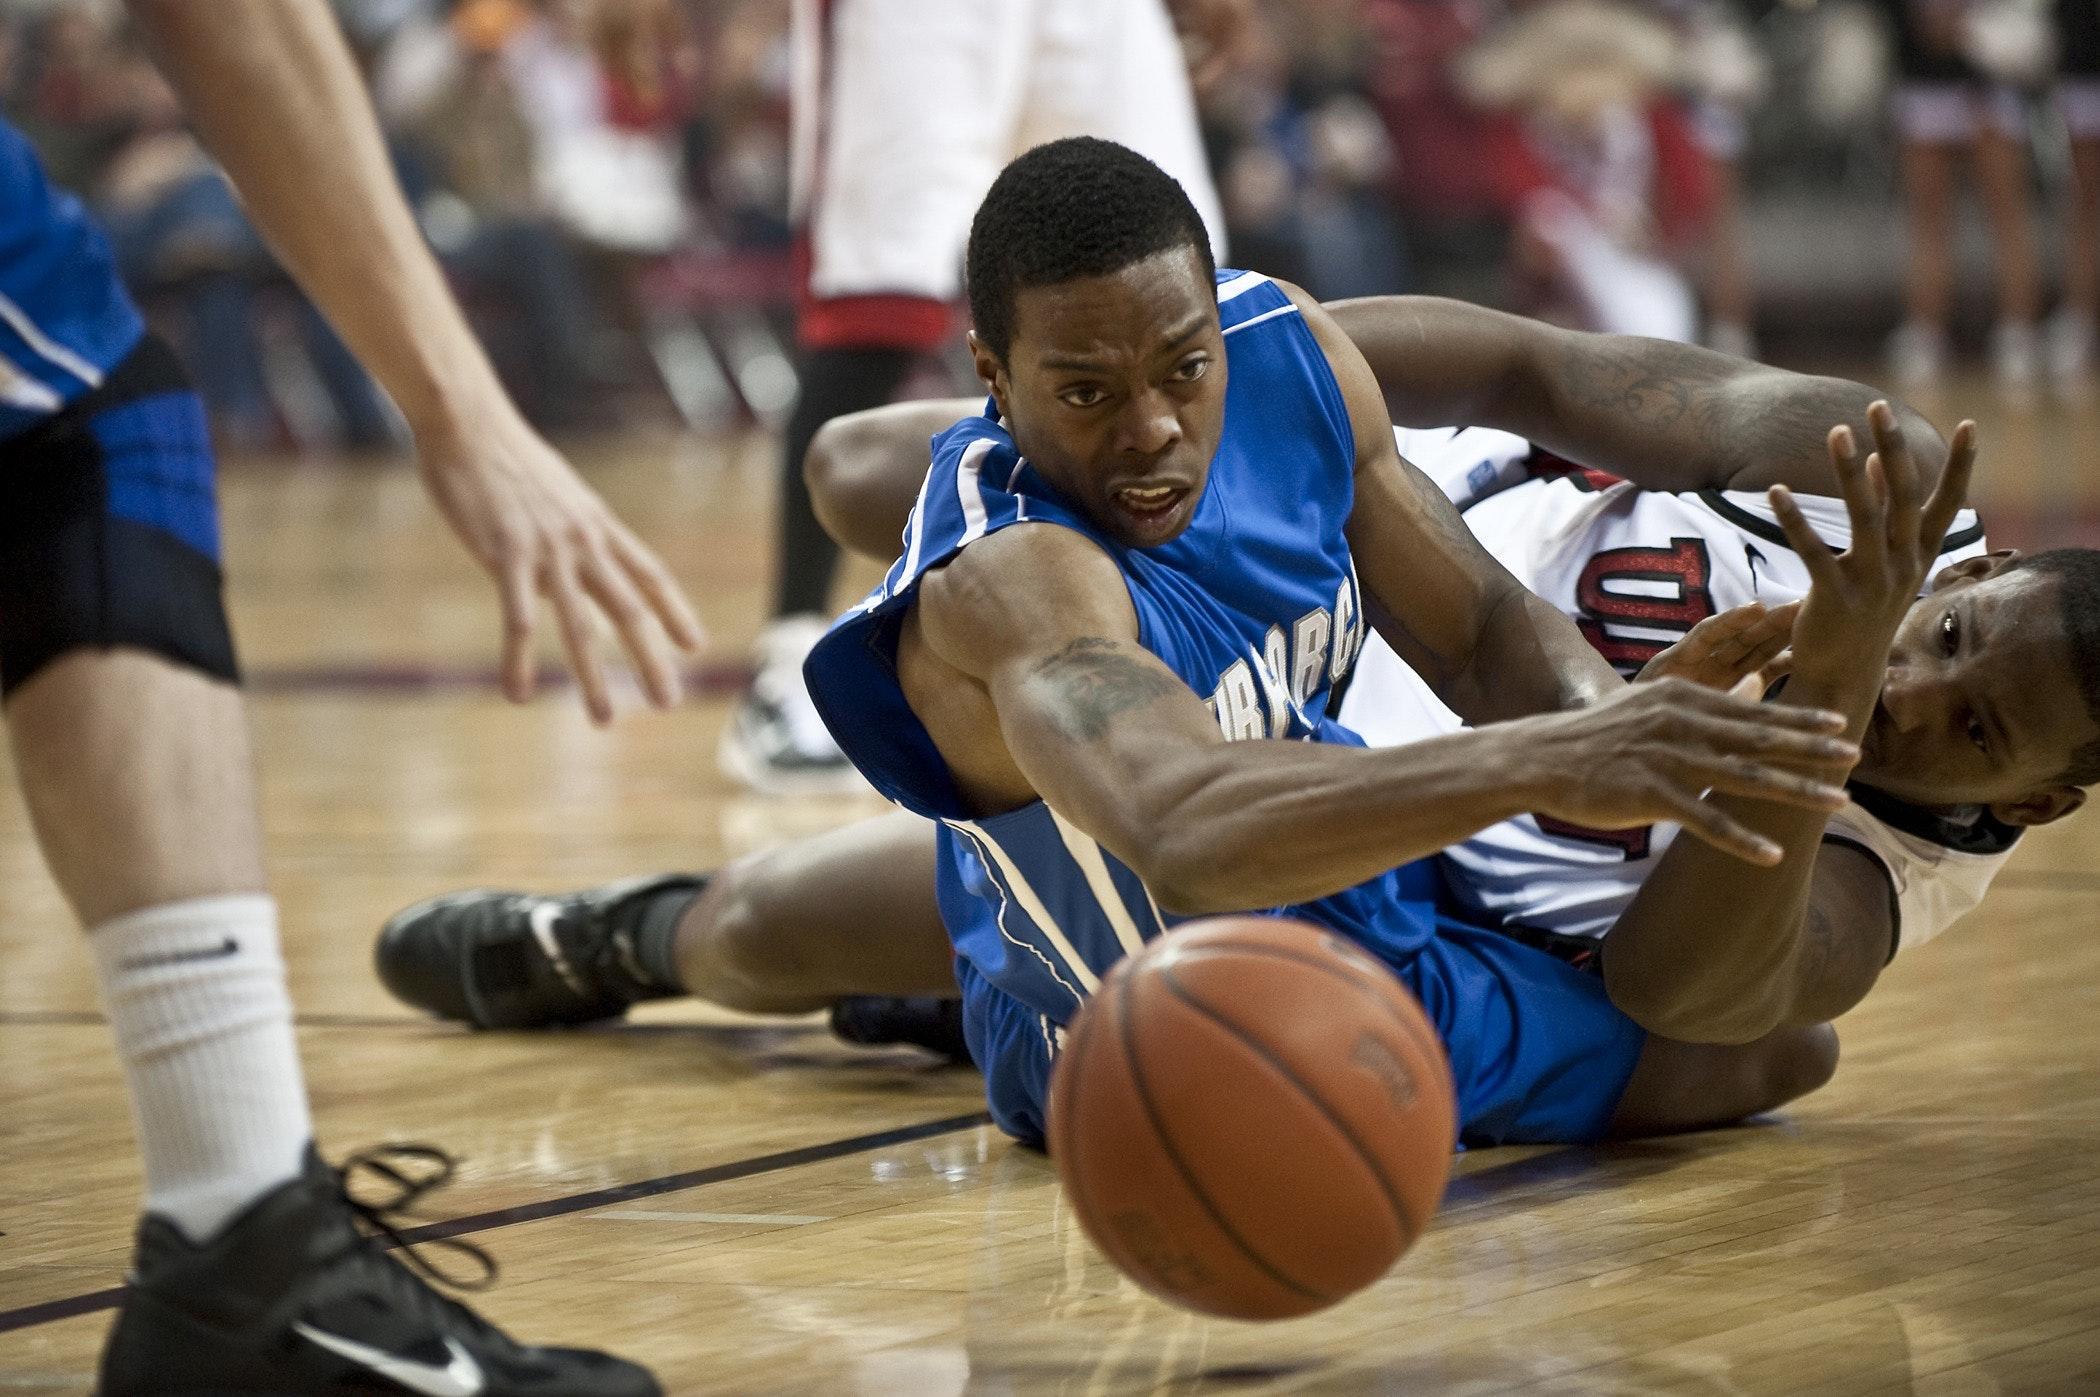 action-athletes-ball-2355